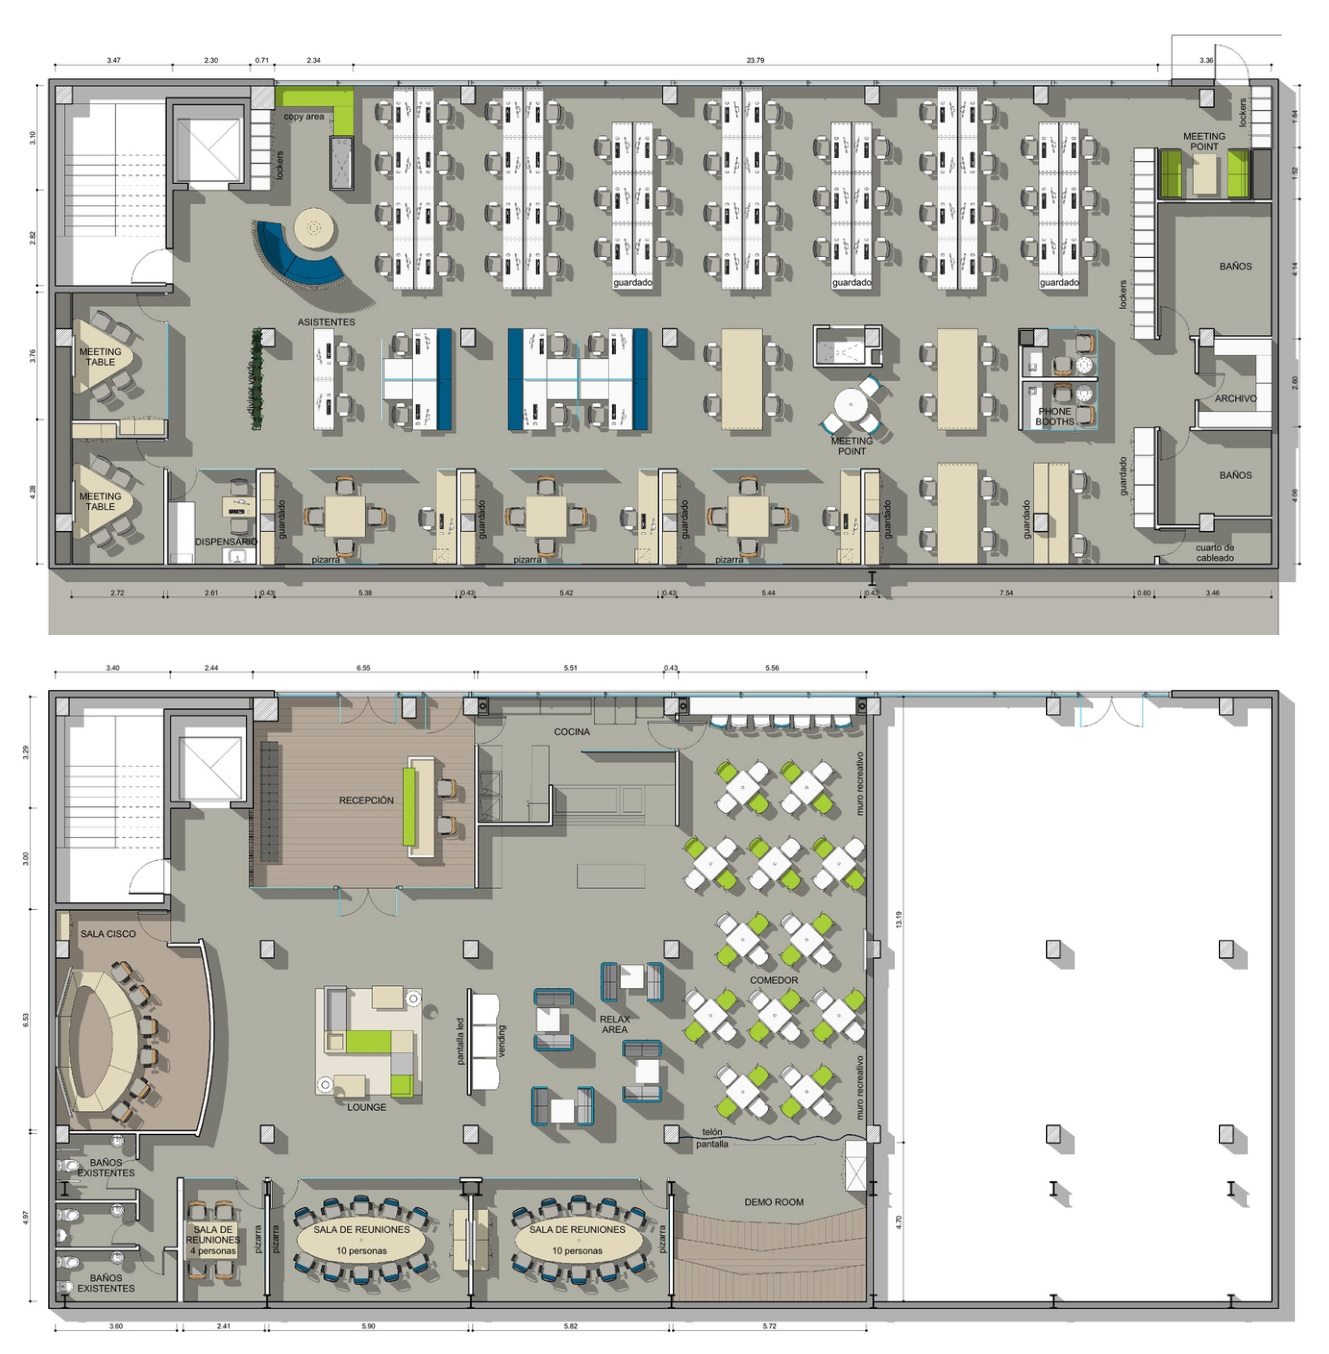 Los 10 dise os de oficinas m s cool for Planos de oficinas modernas